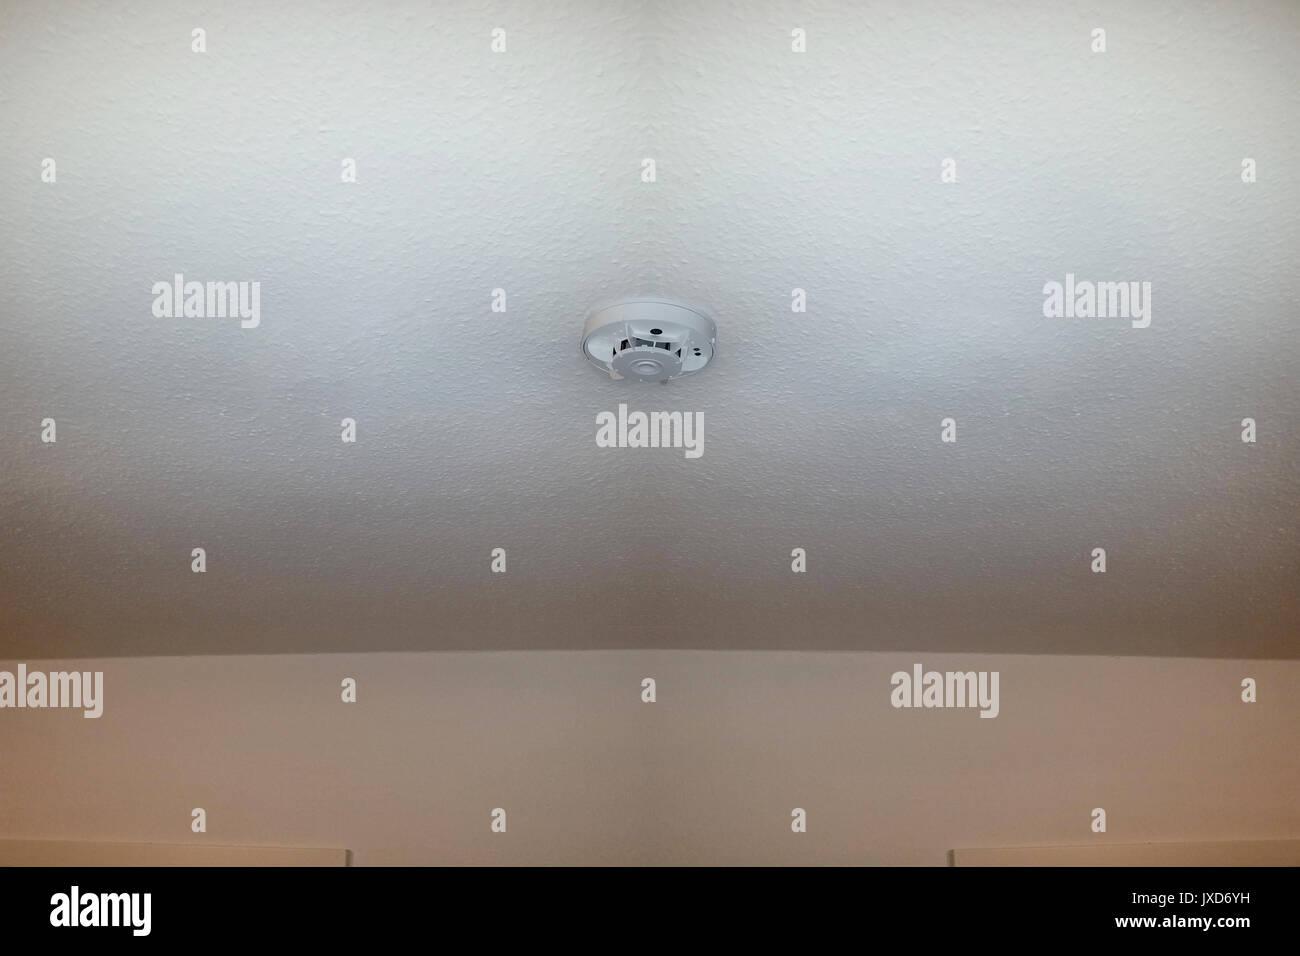 Light Signal Sensor Stockfotos & Light Signal Sensor Bilder - Alamy